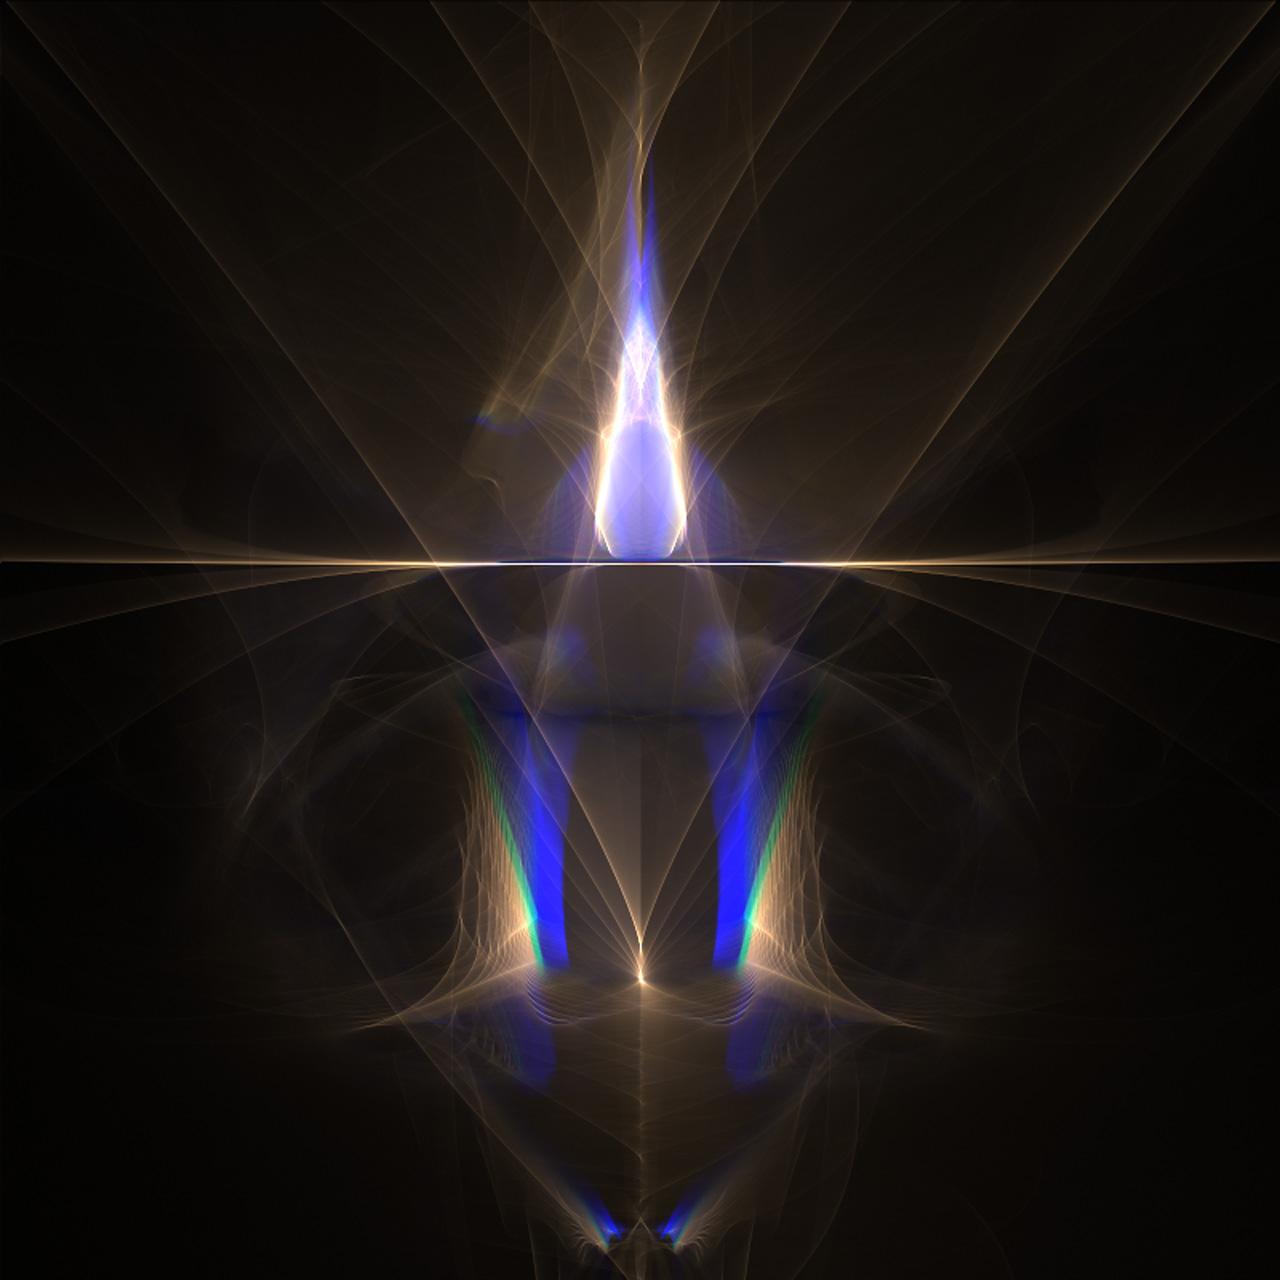 software_buddhabrot_image33